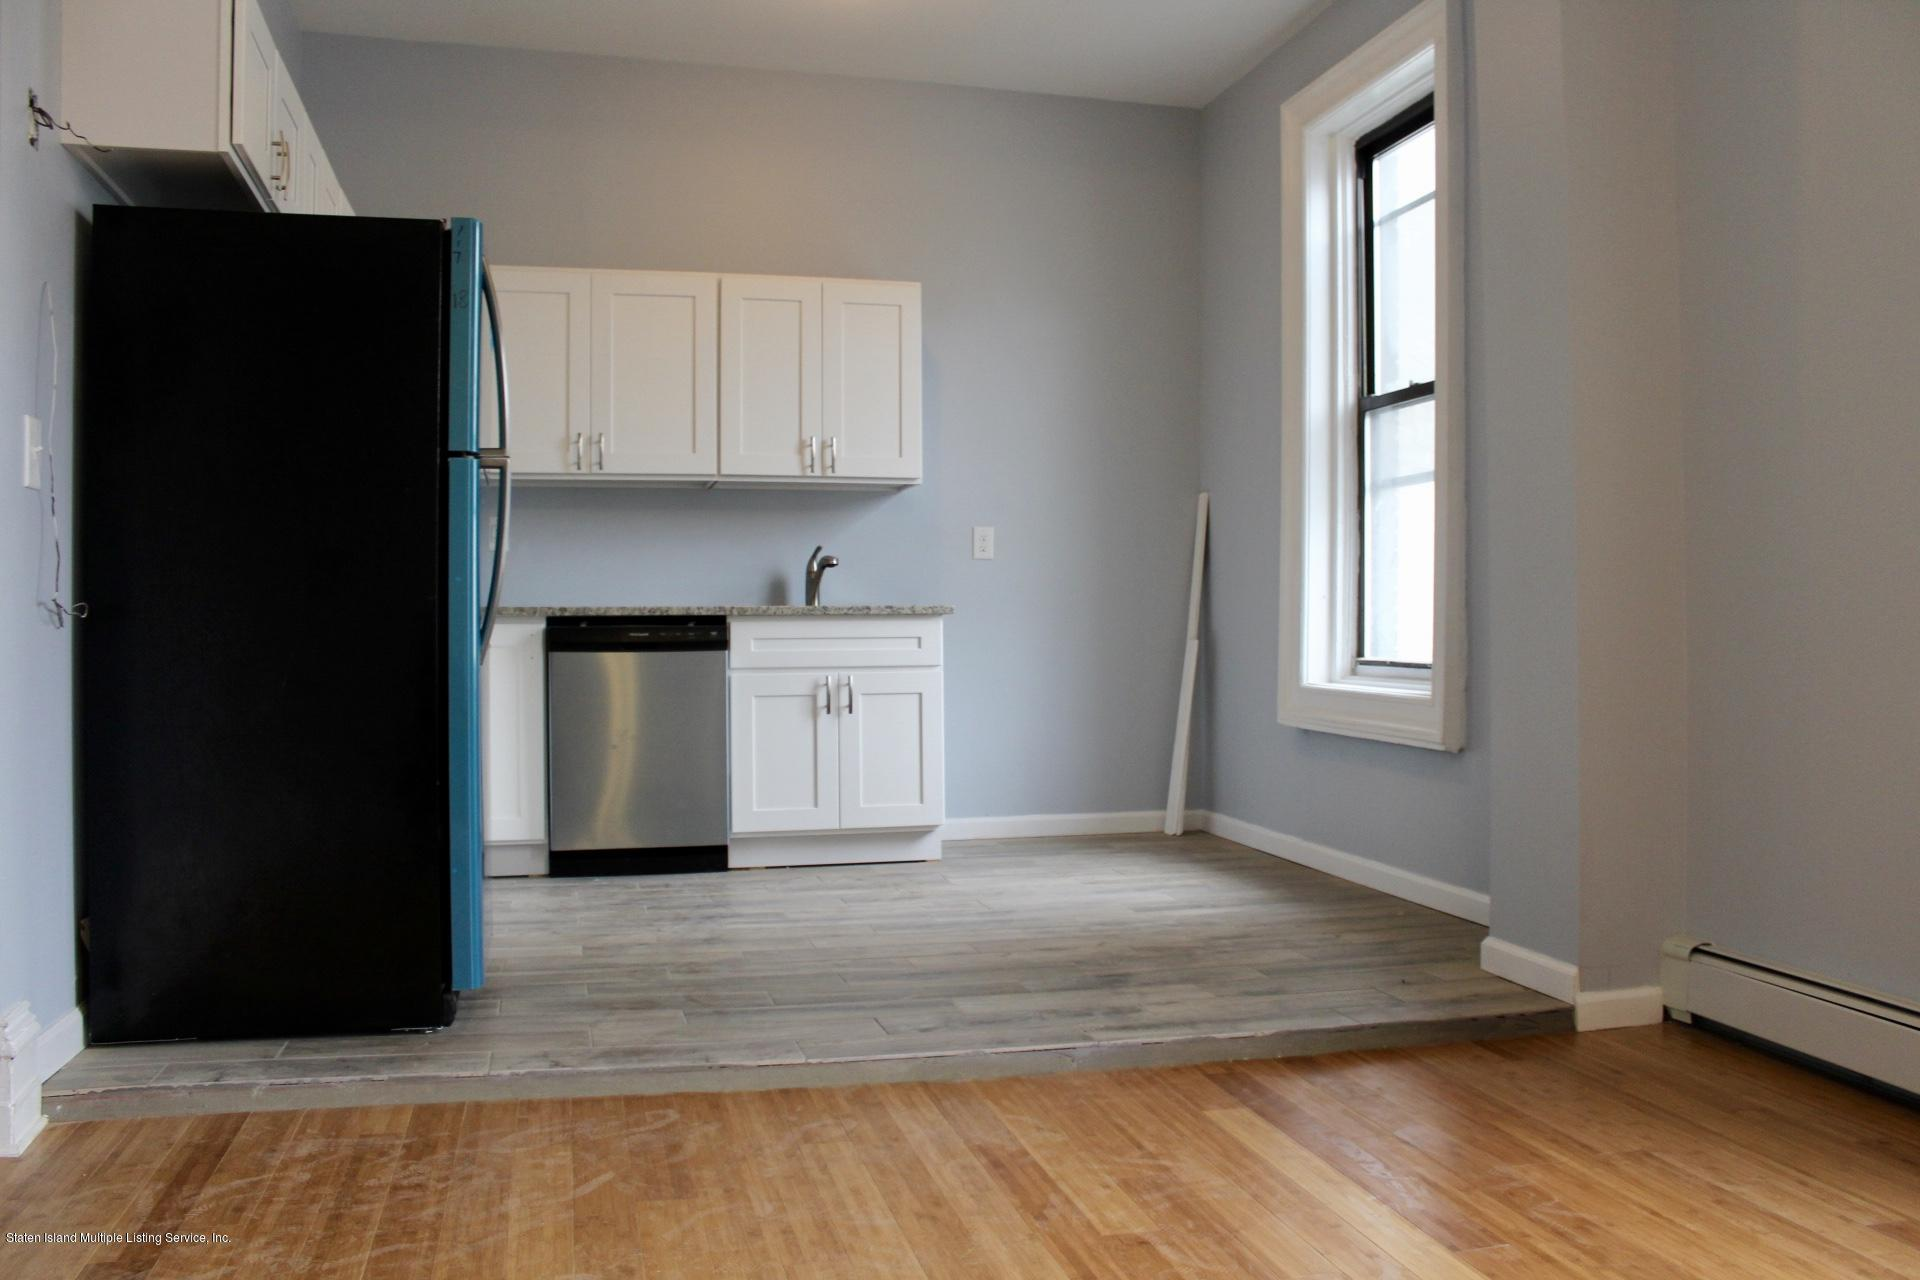 1 7 Beach Street,Staten Island,New York,10304,United States,3 Bedrooms Bedrooms,6 Rooms Rooms,1 BathroomBathrooms,Res-Rental,Beach,1122929